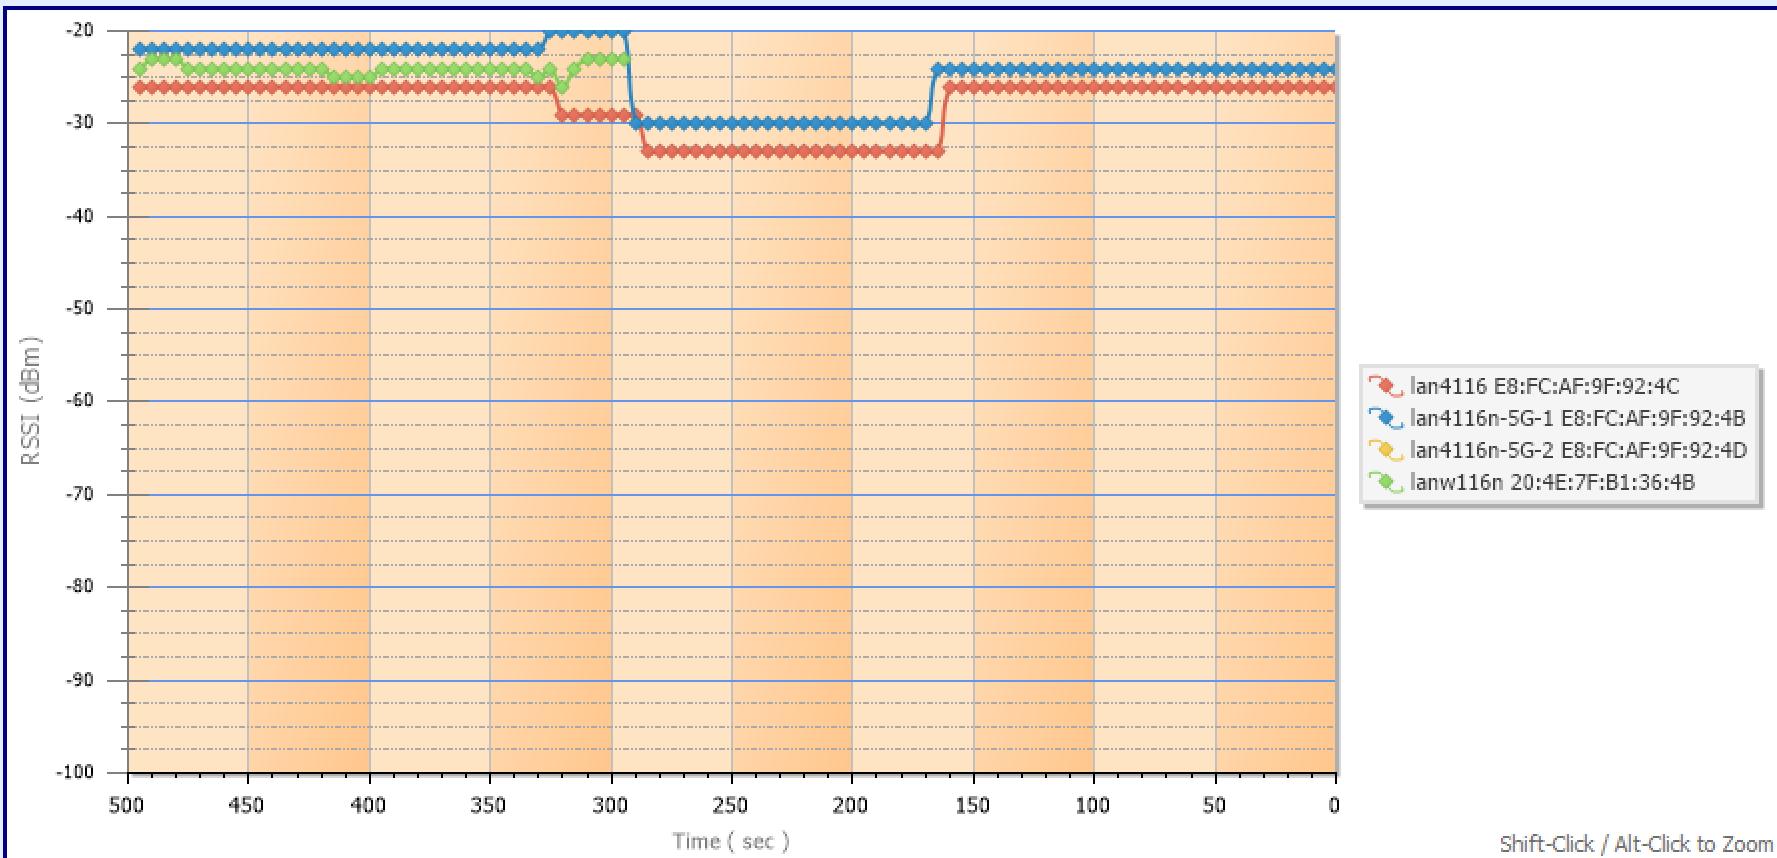 Netgear Nighthawk X6 tri-band R8000 router | Jim Rome's